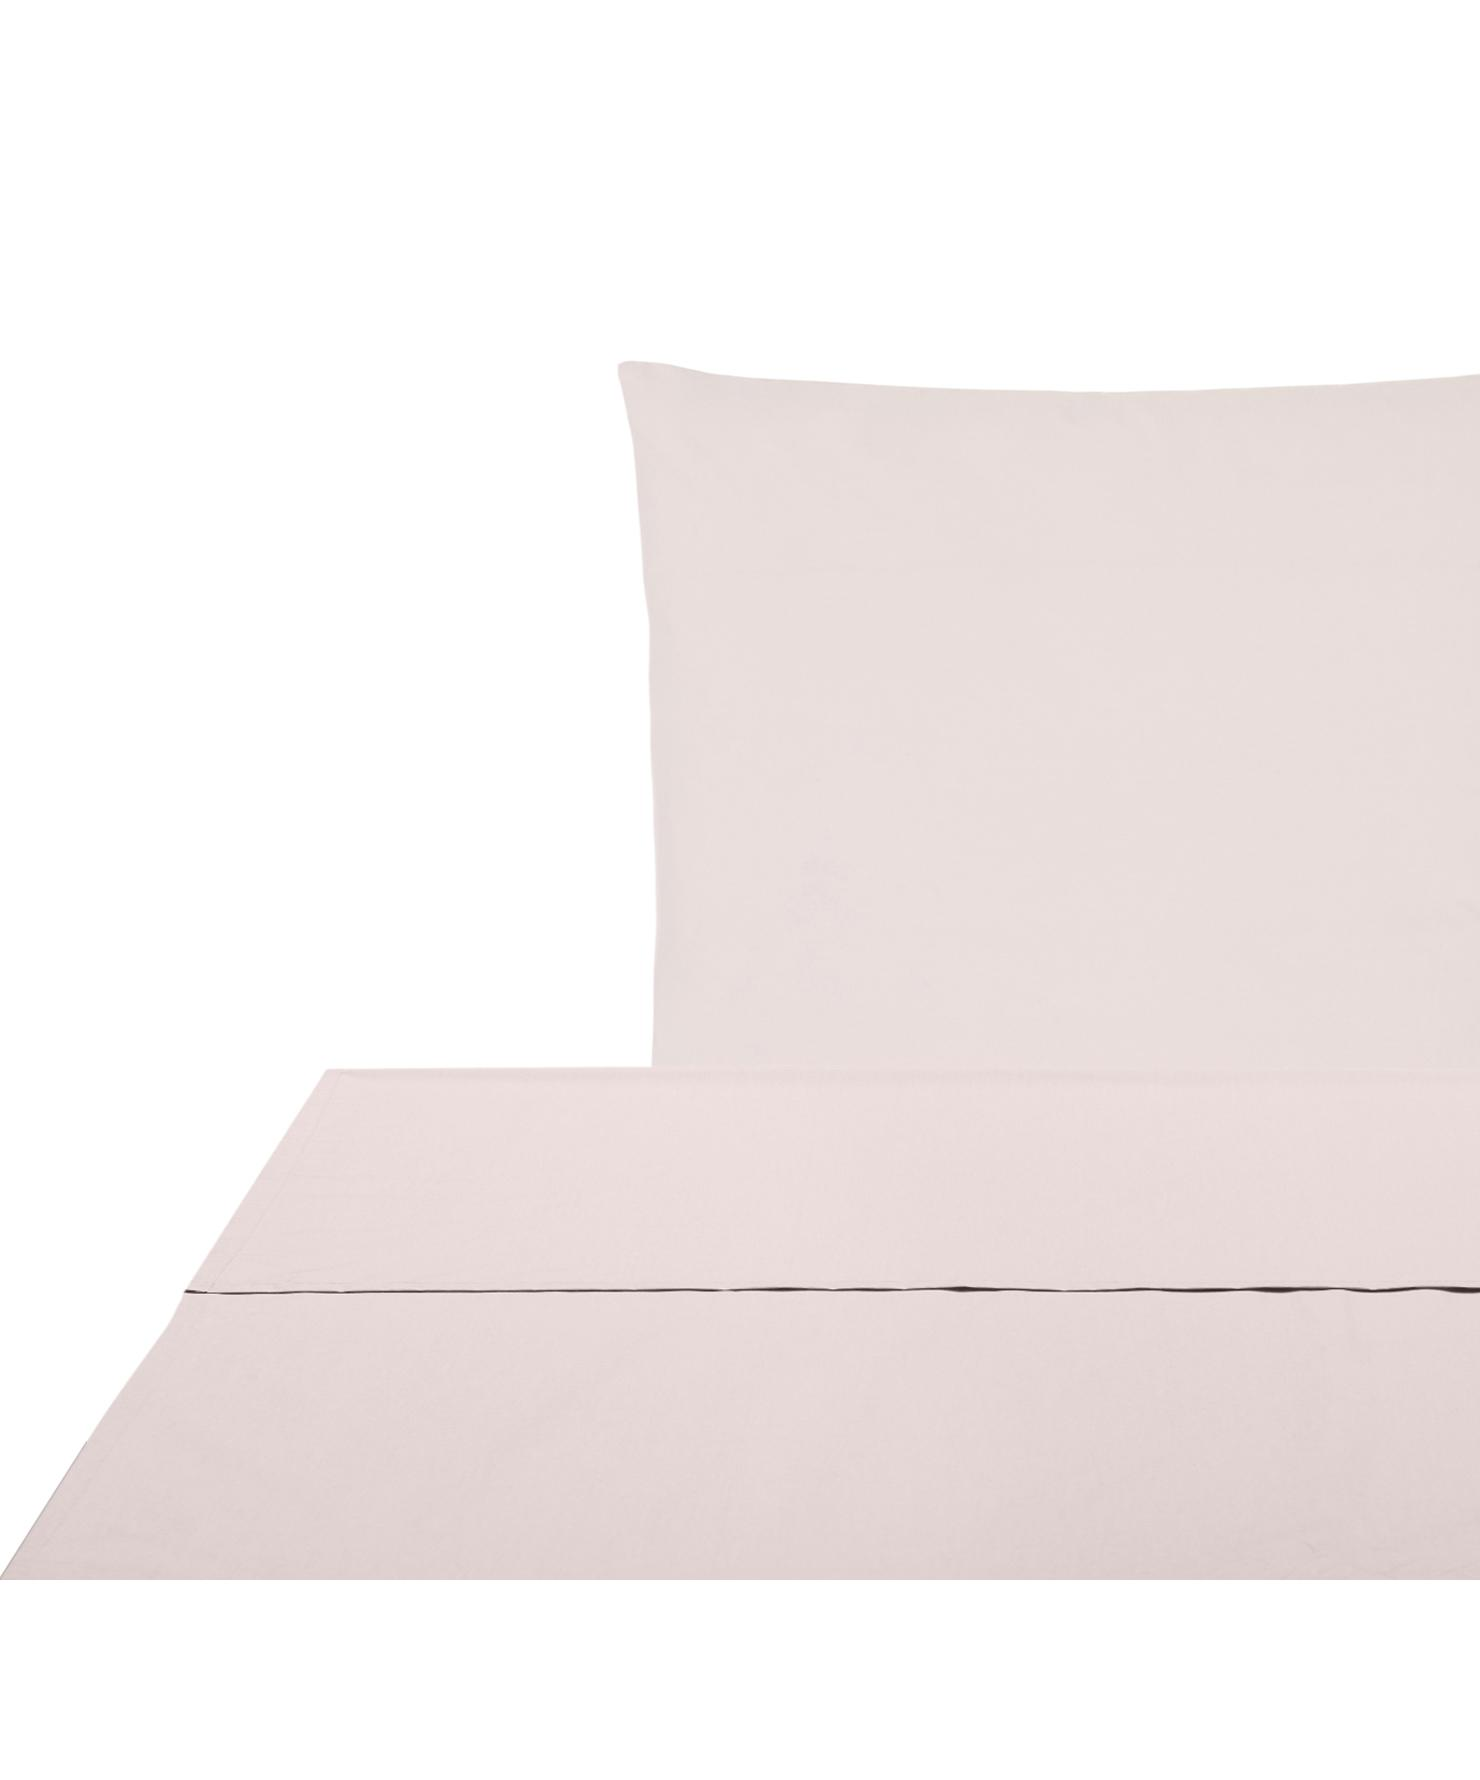 Set lenzuola in percalle Elsie 2 pz, Tessuto: percalle Densità del filo, Rosa, 150 x 300 cm